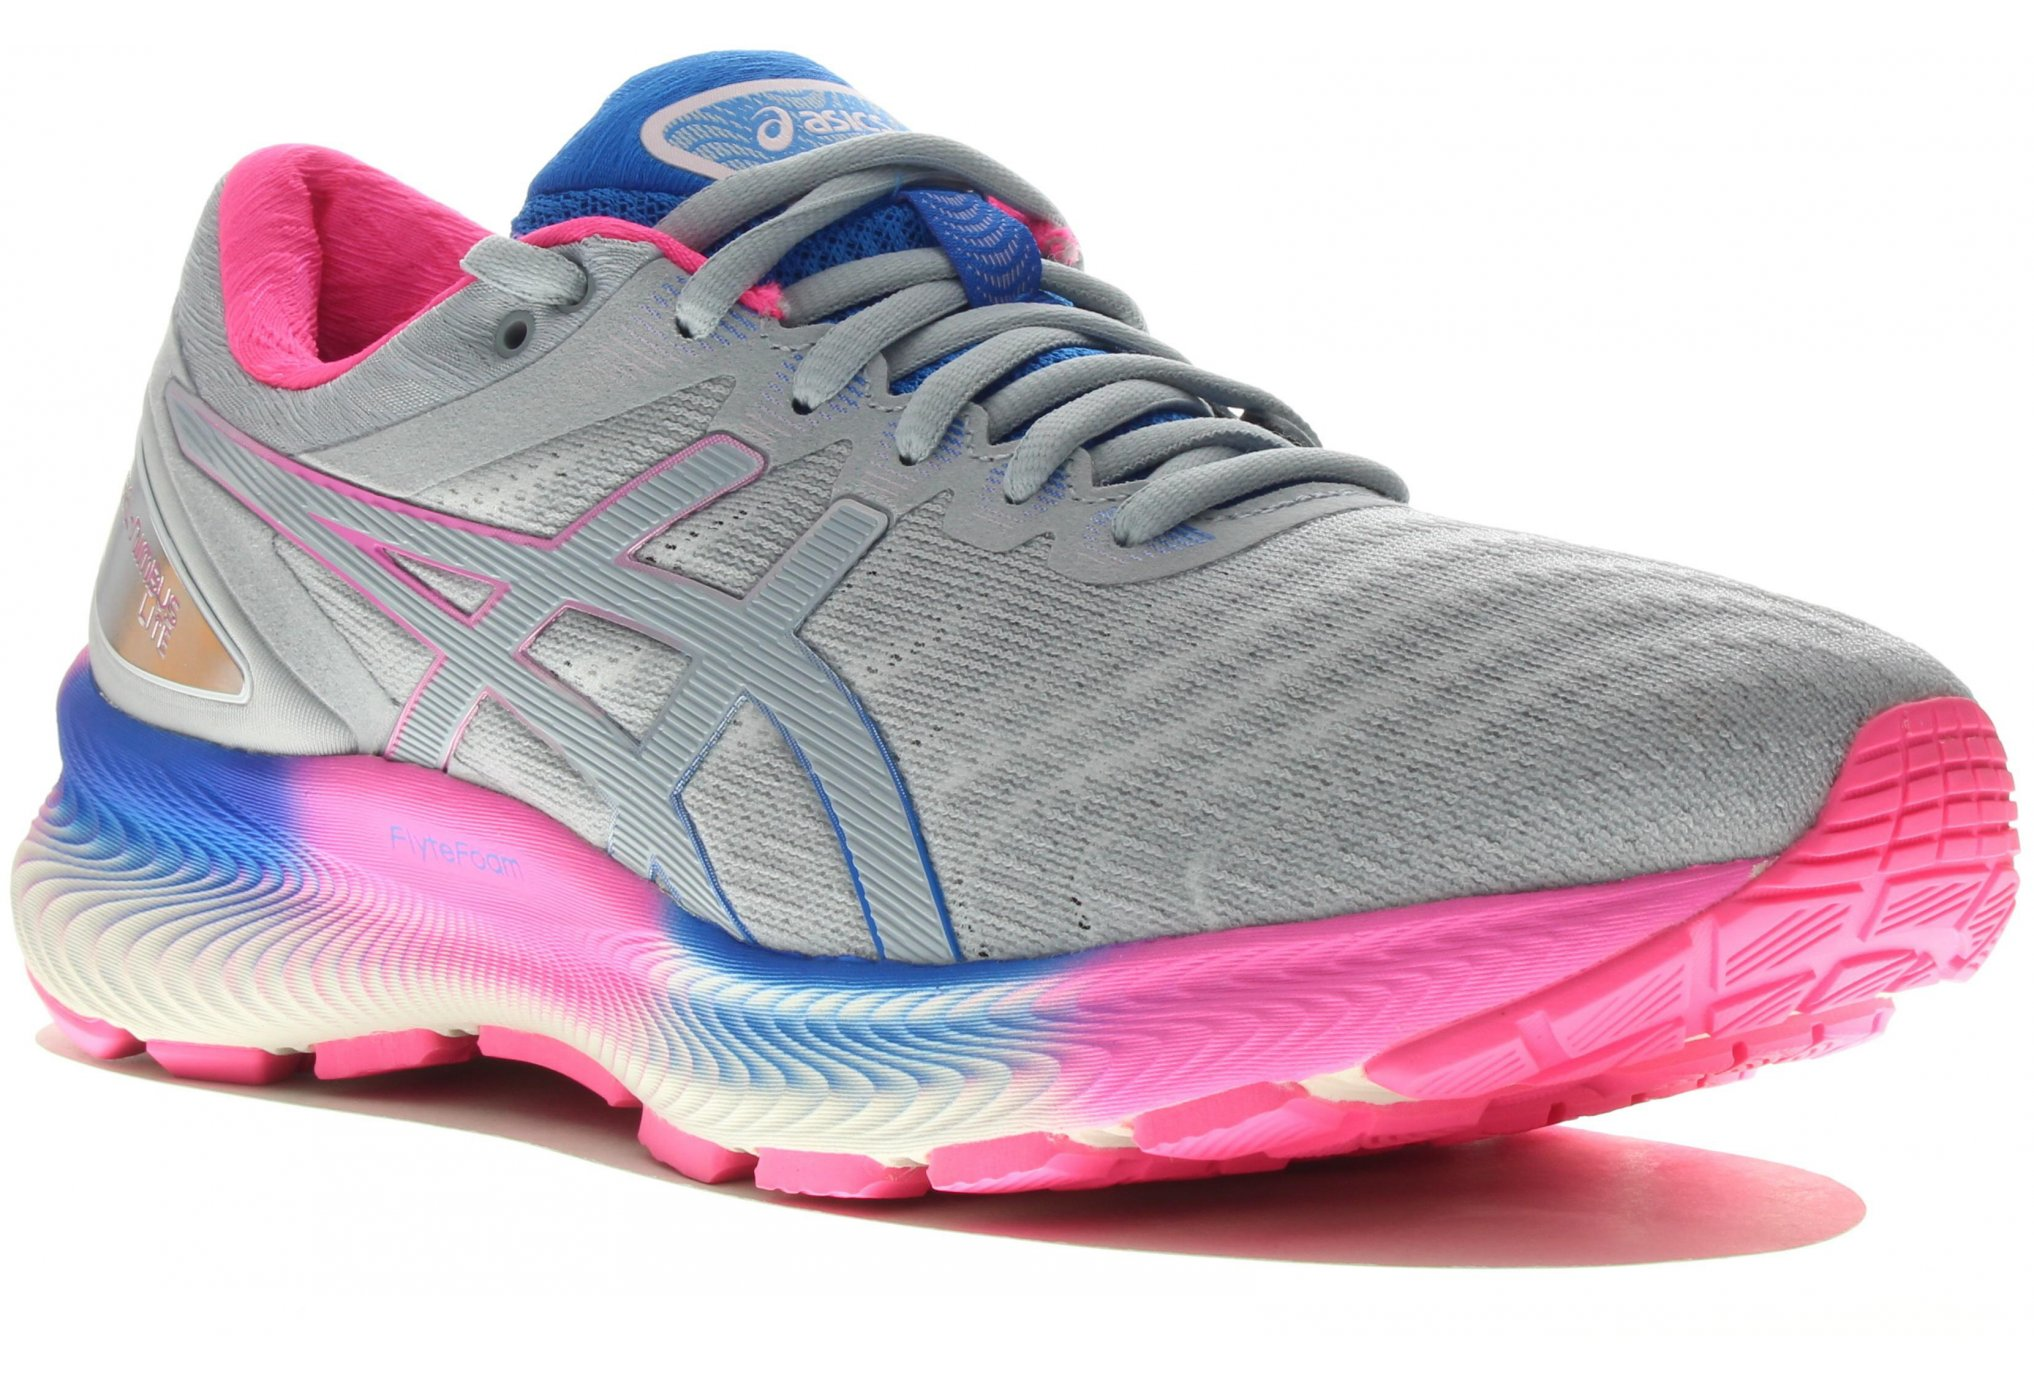 Asics Gel-Nimbus Lite W Chaussures running femme